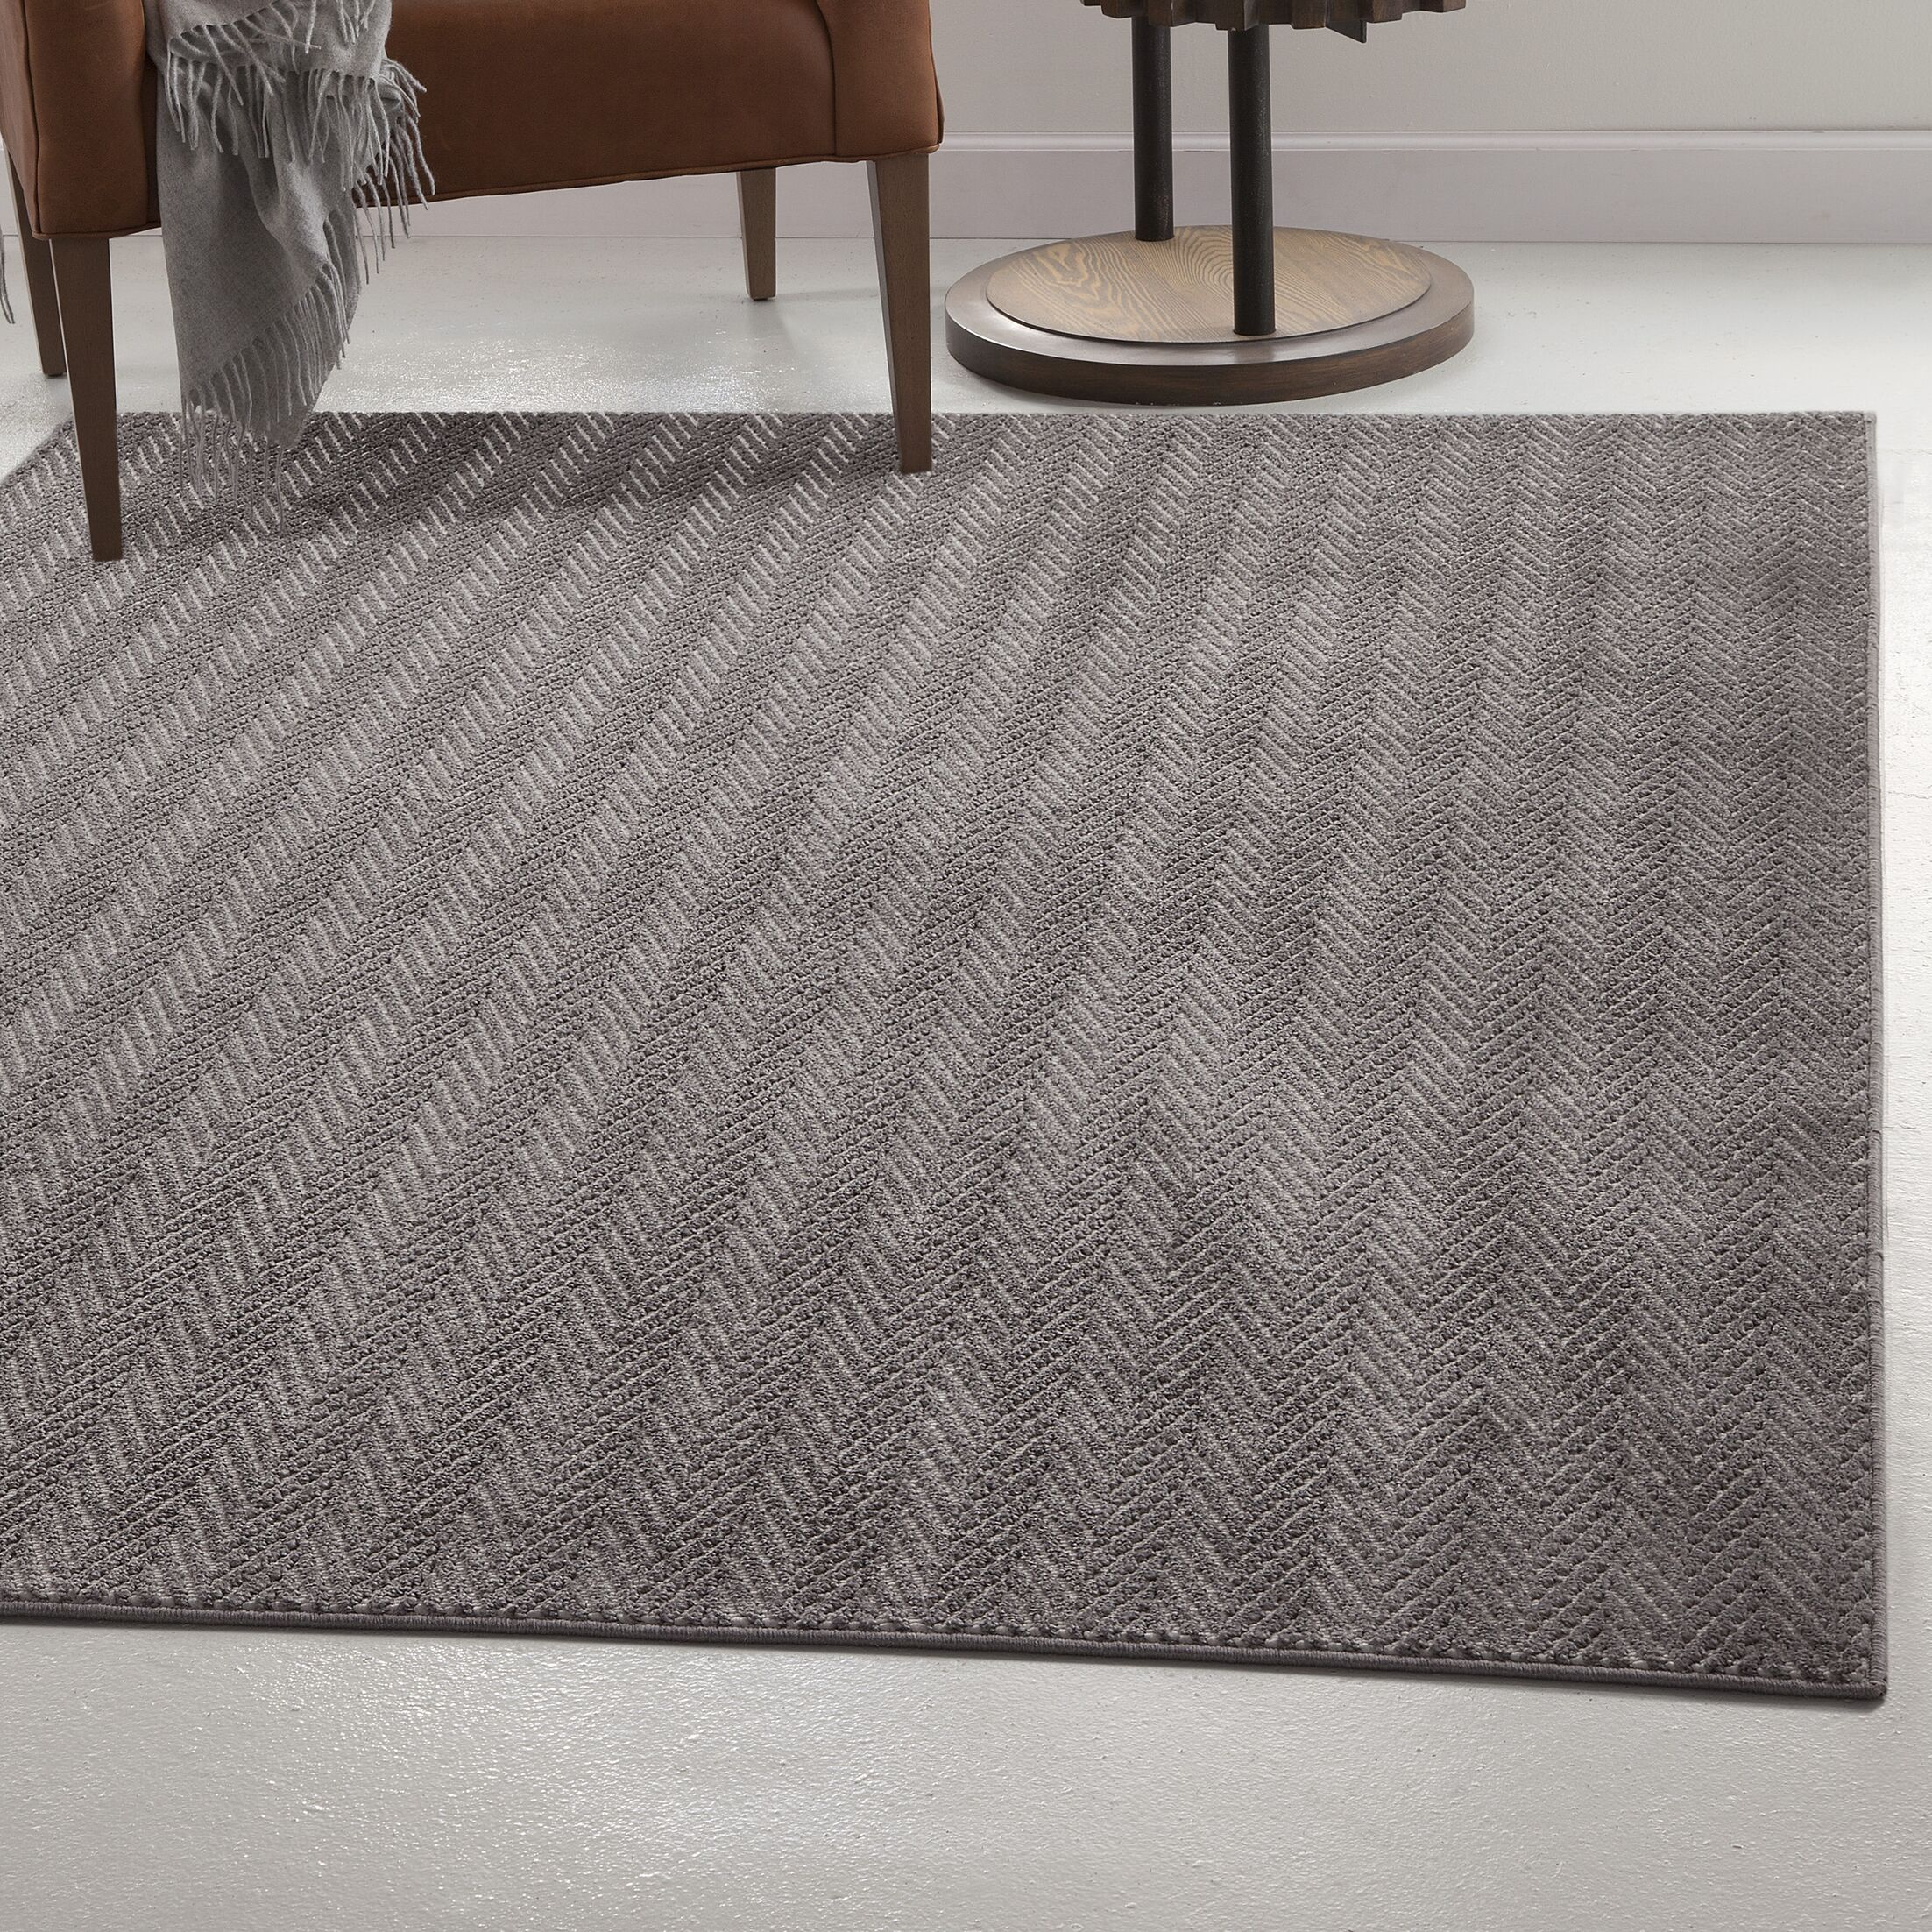 Highlands Charcoal Area Rug Rug Size: 5' x 8'